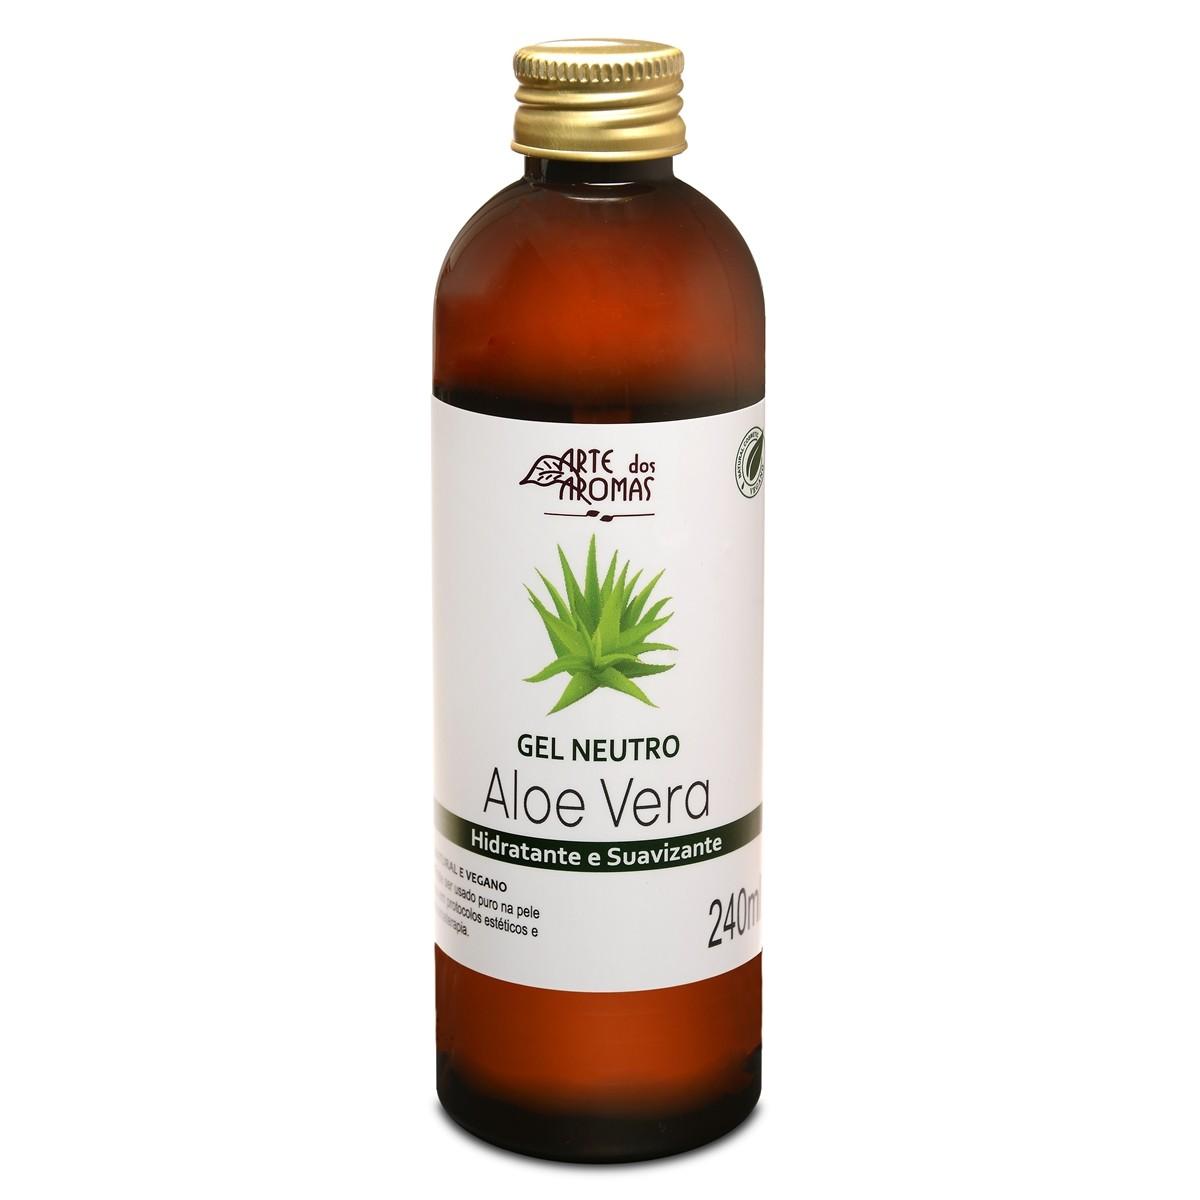 Gel Aloe Vera Natural e Vegano Arte dos Aromas 240 ml